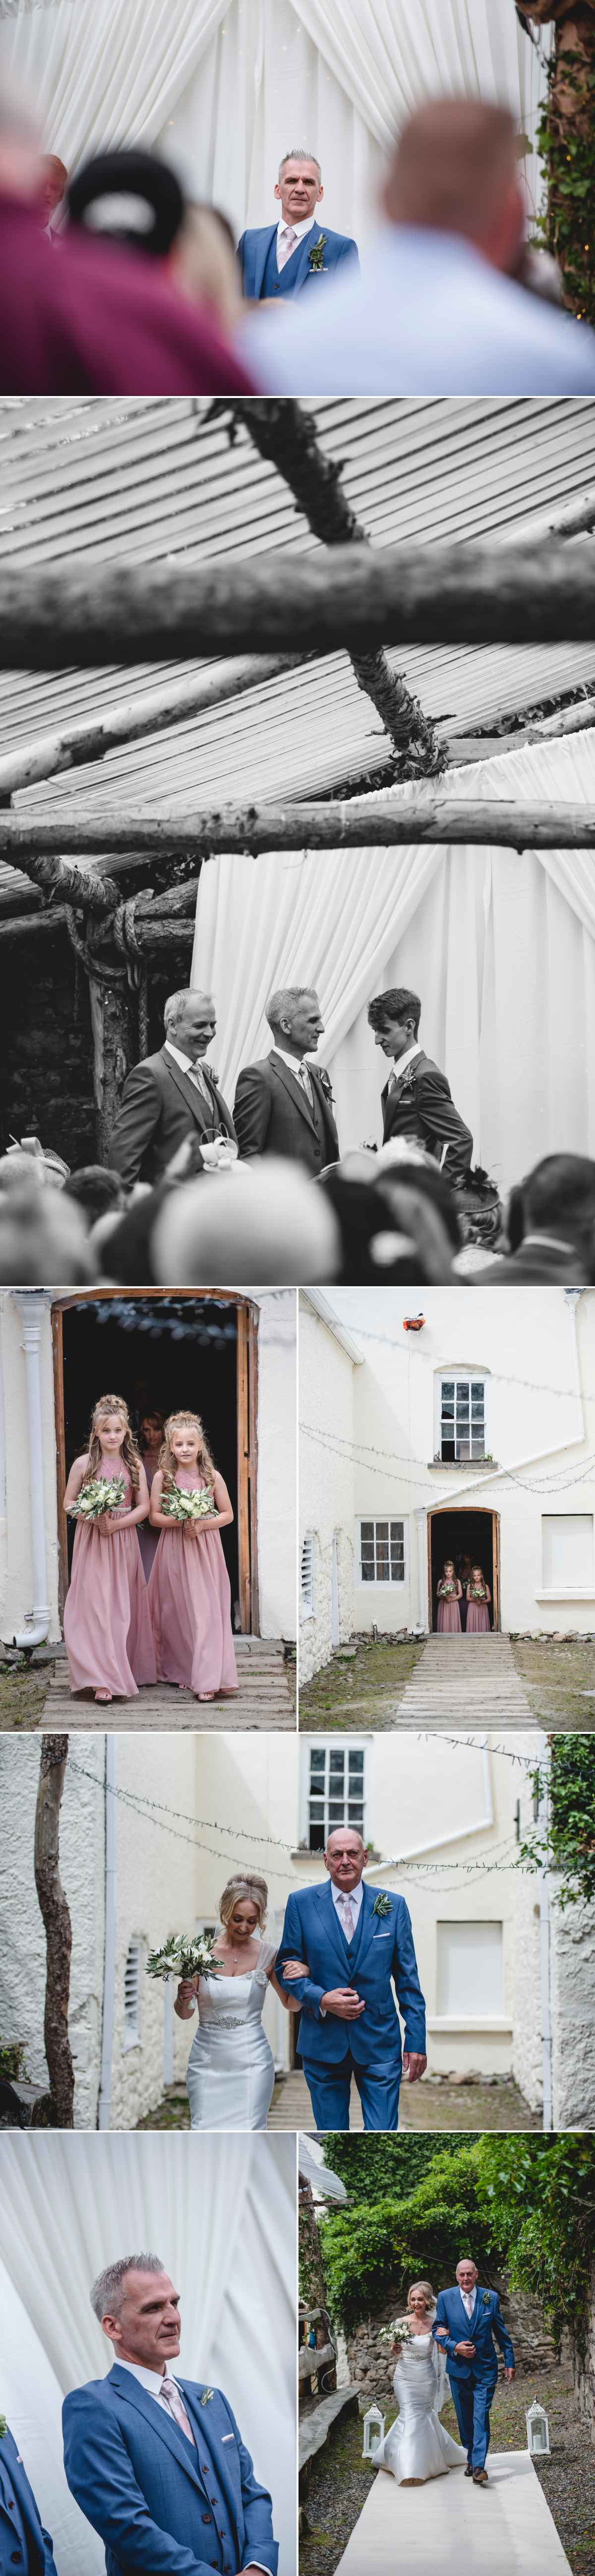 Rustic Wedding Ireland Photographer 08.jpg